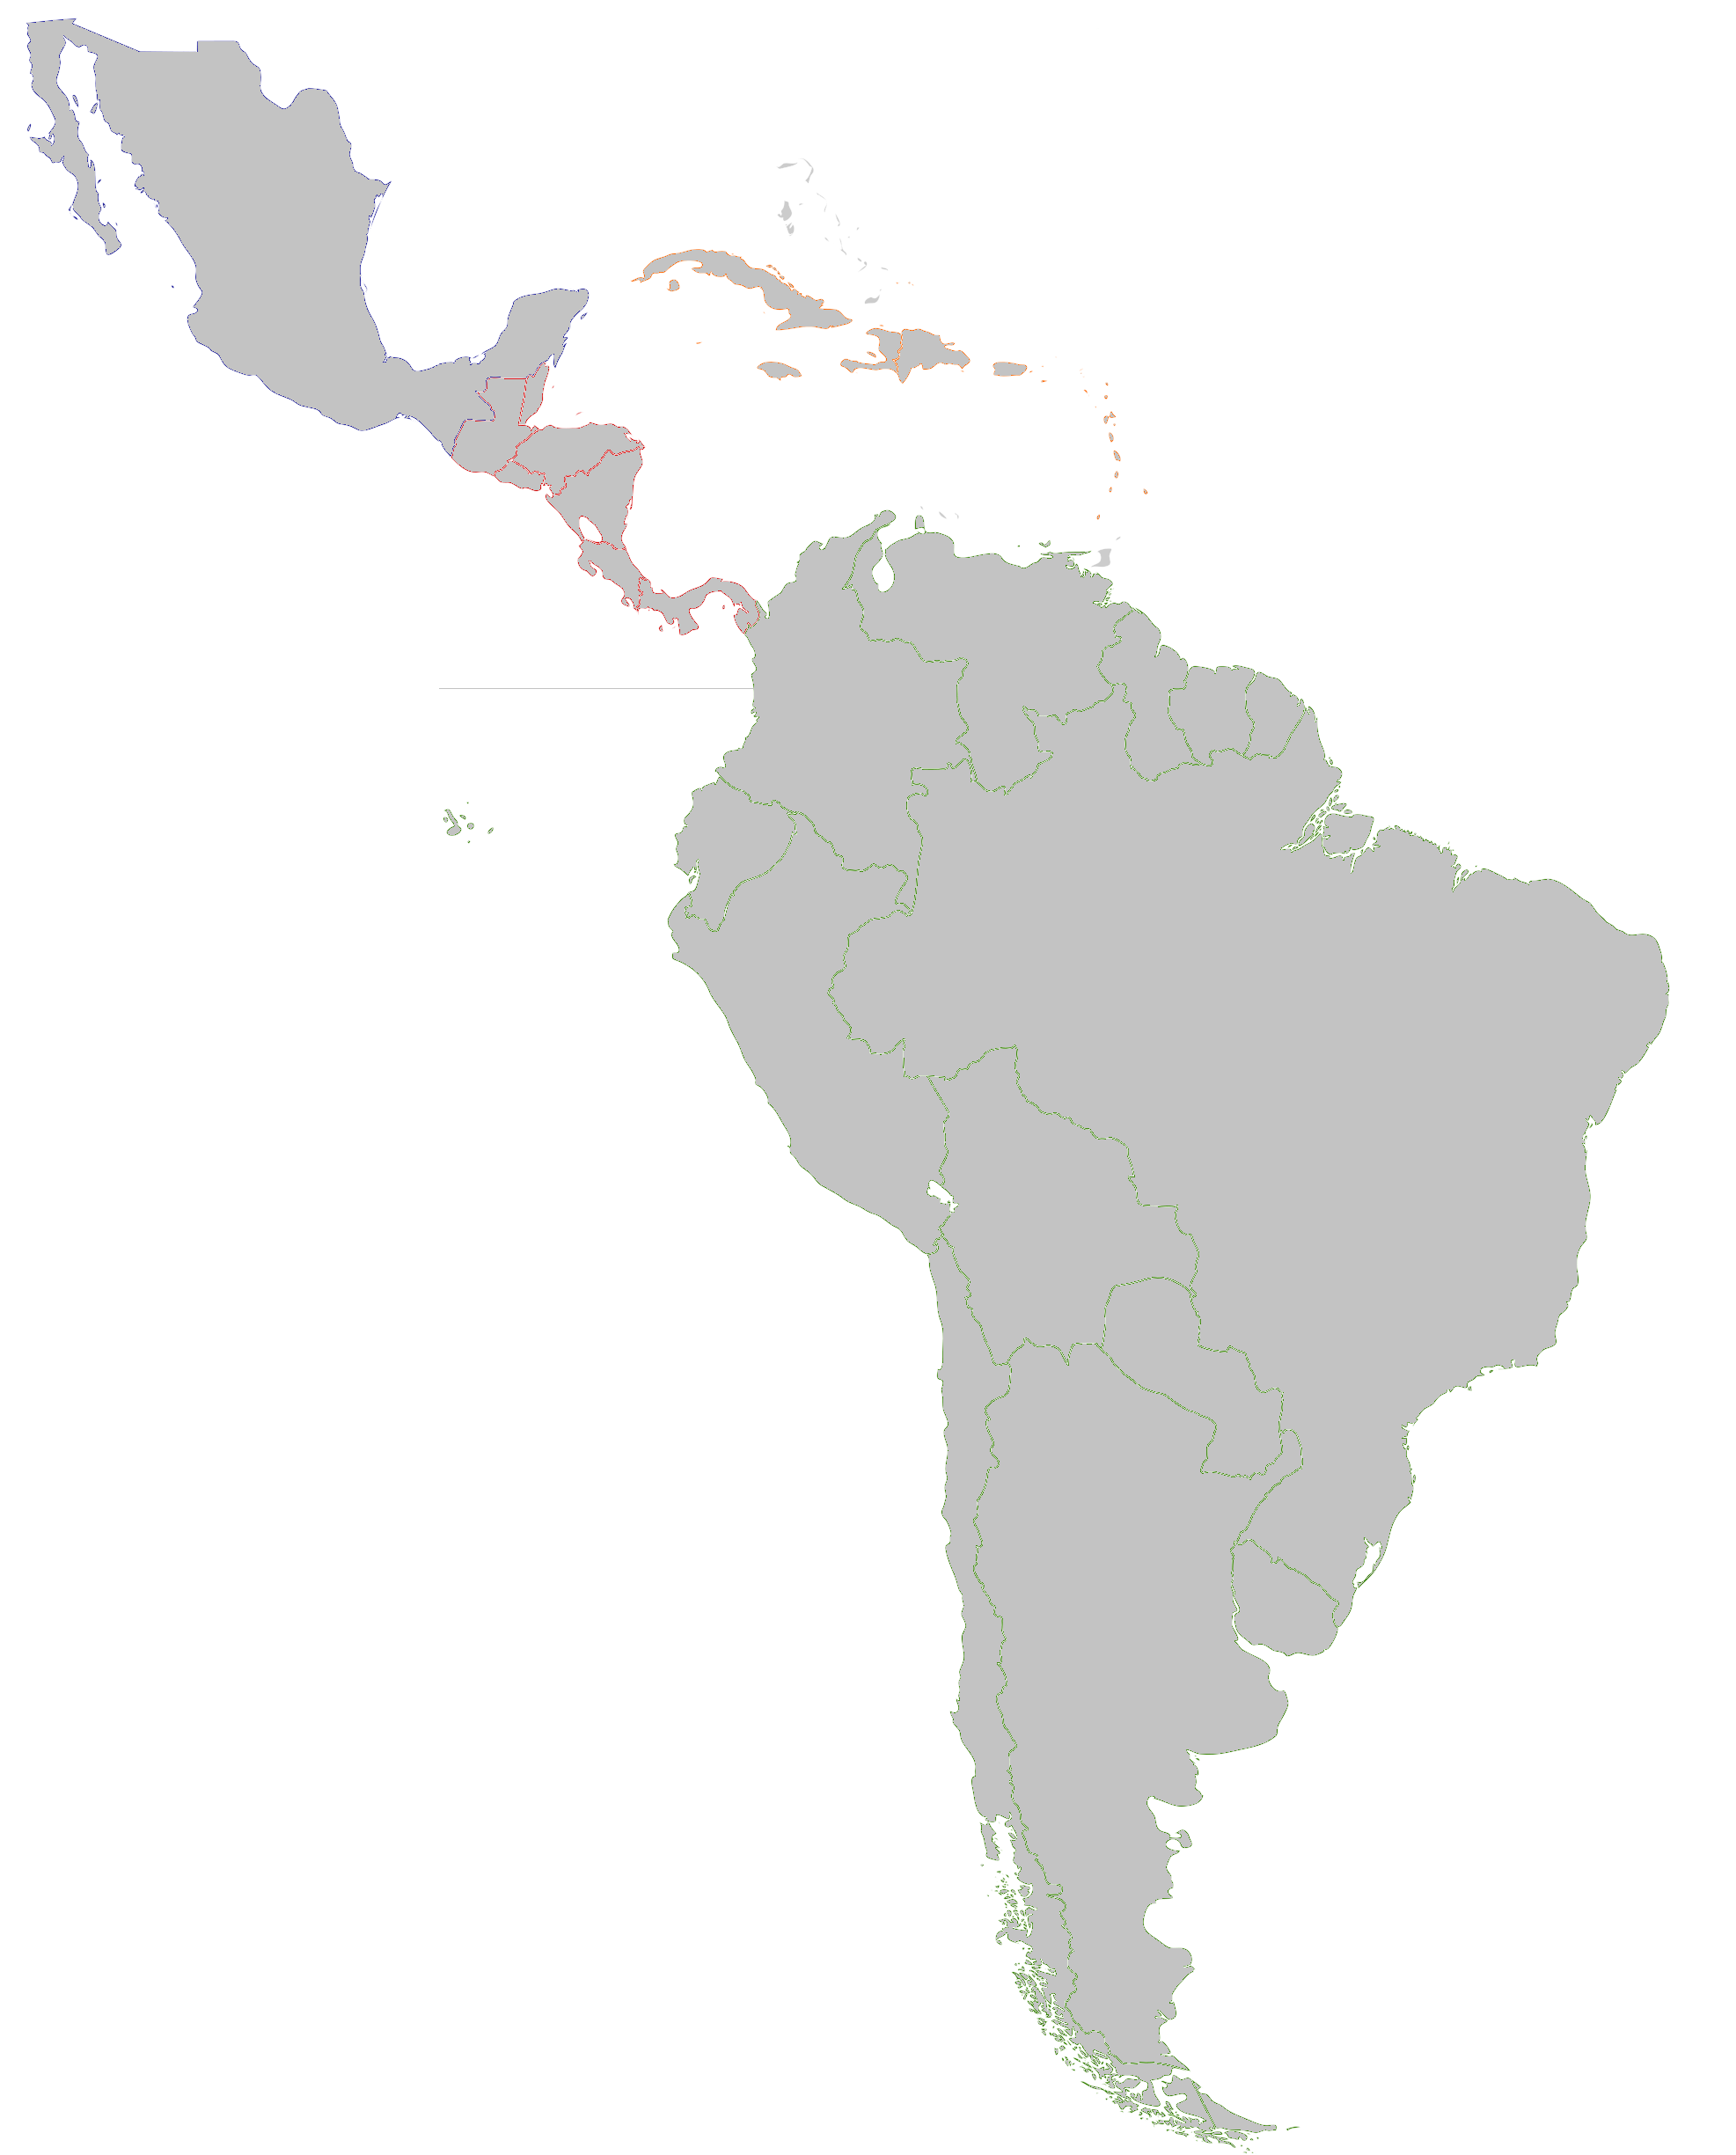 CategoryTerminal Velocity Latin America Map Game Map Game - Map of the latin america